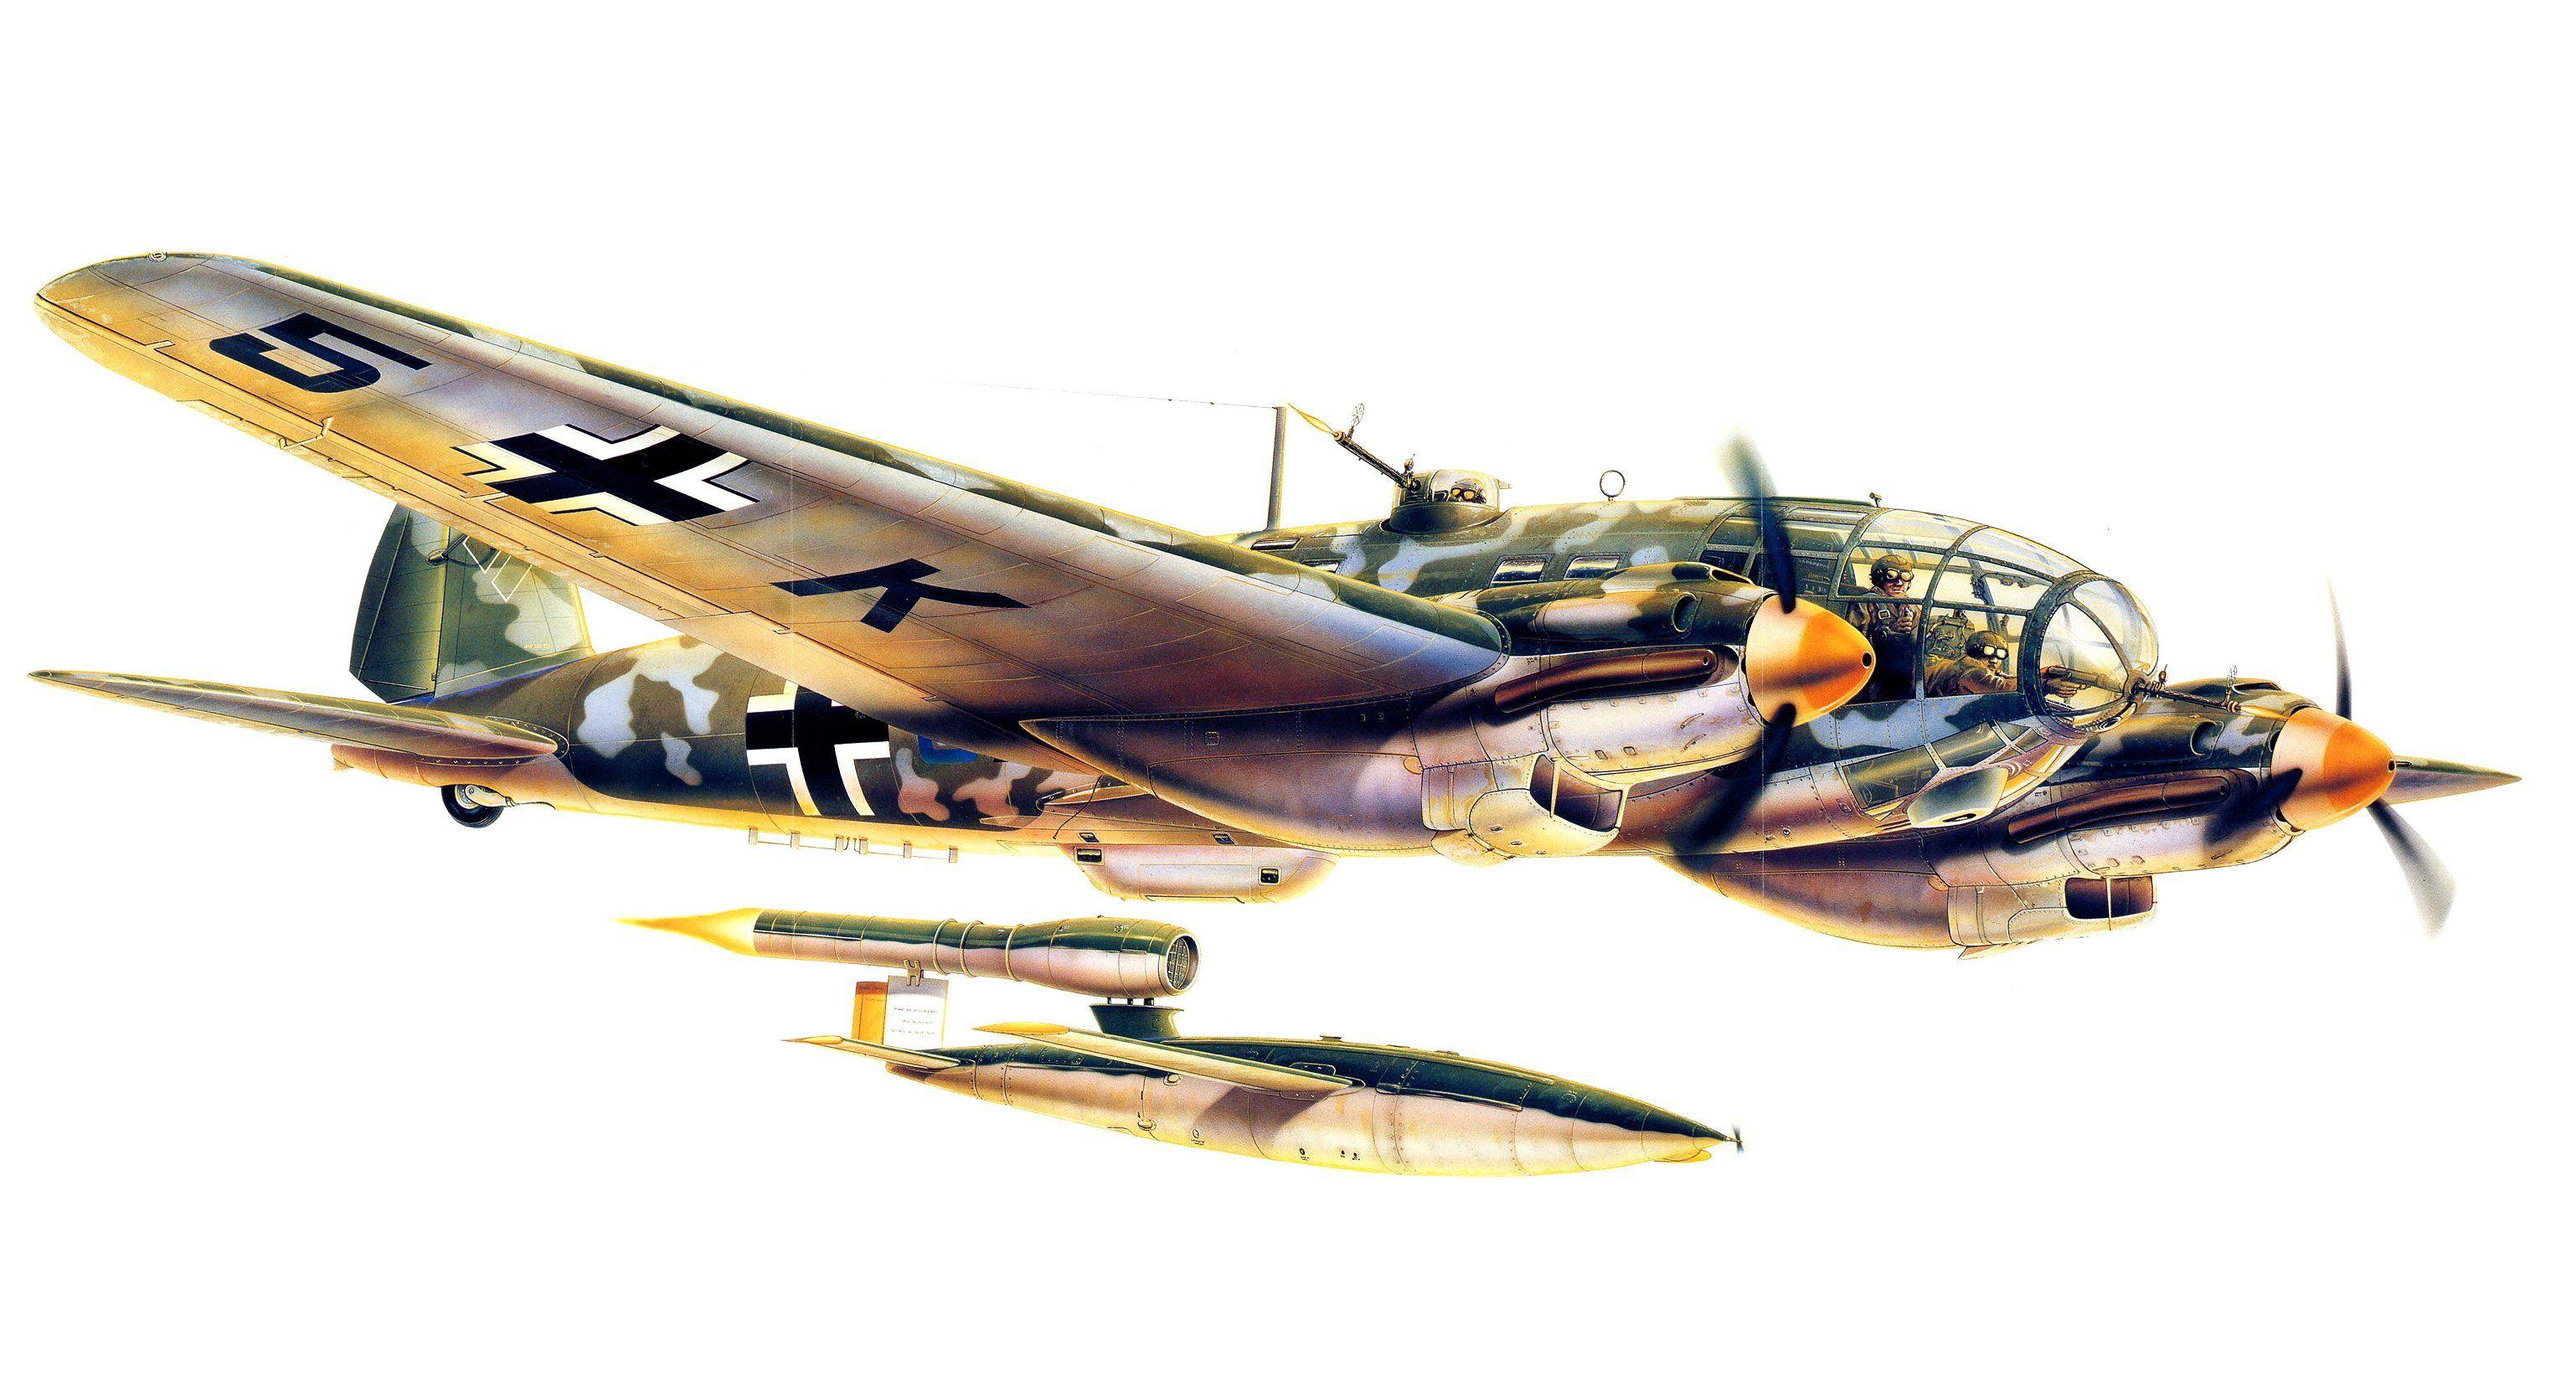 Heinkel He 111H-22 + Fieseler Fi 103 V-1, Netherlands, late 1944